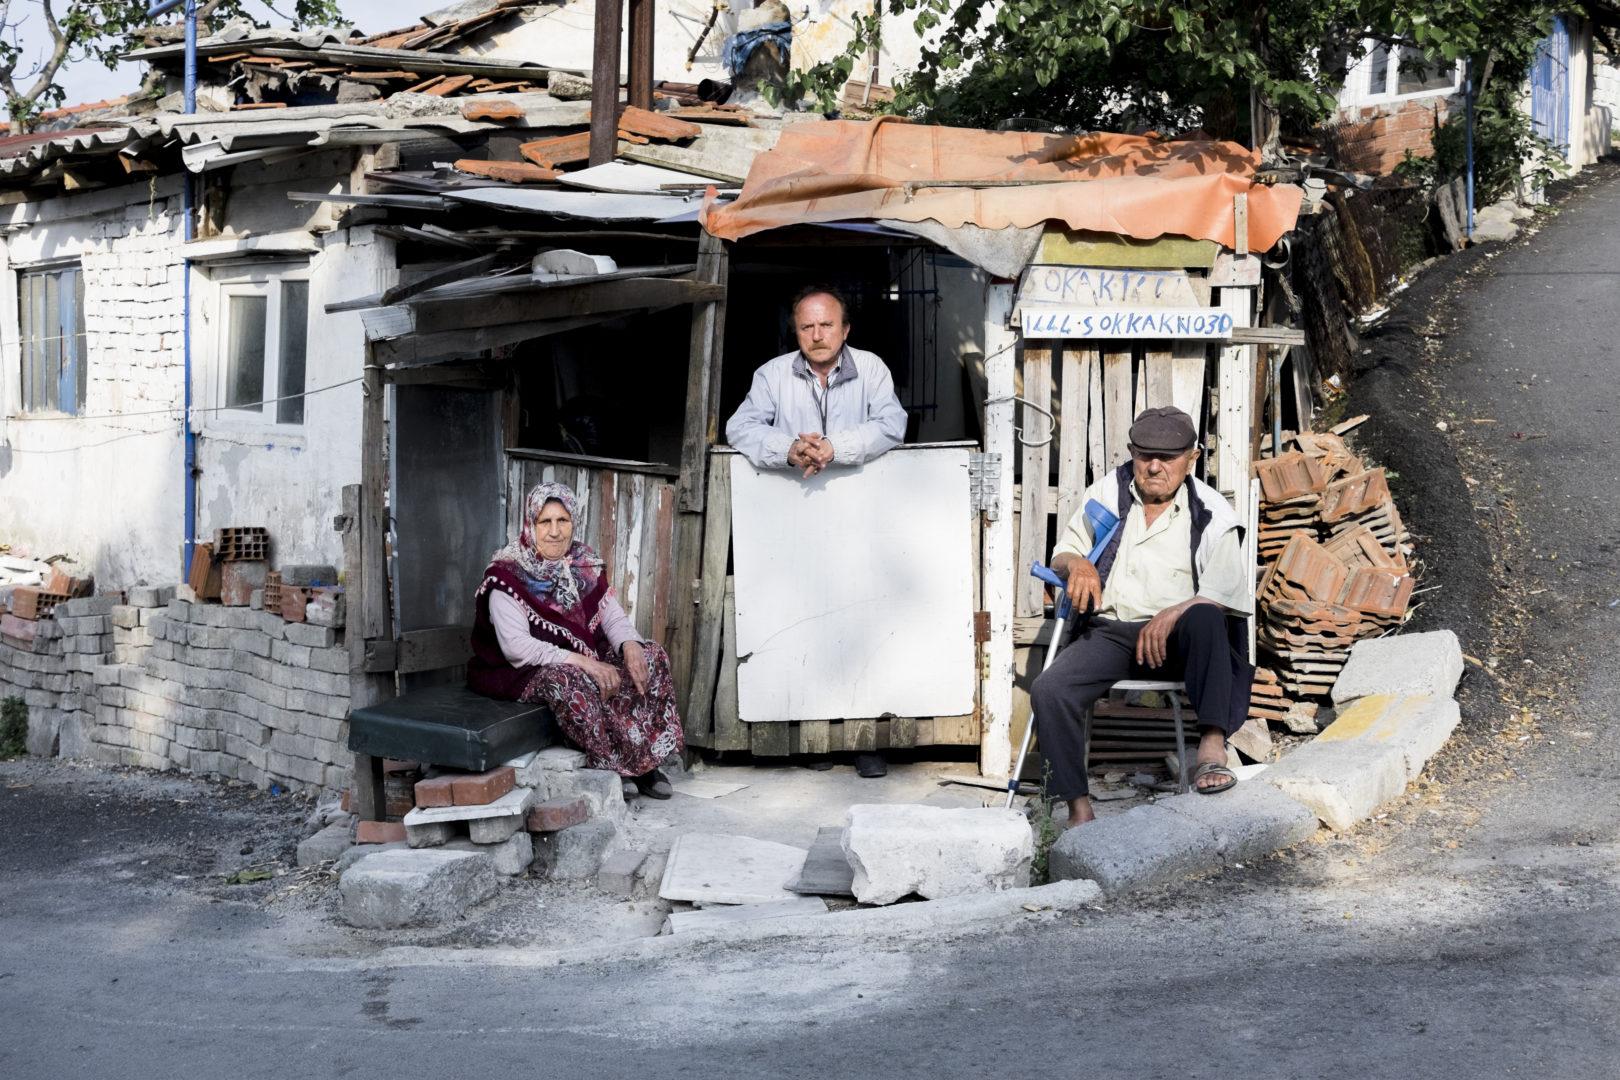 Fotos: Serkan Akın